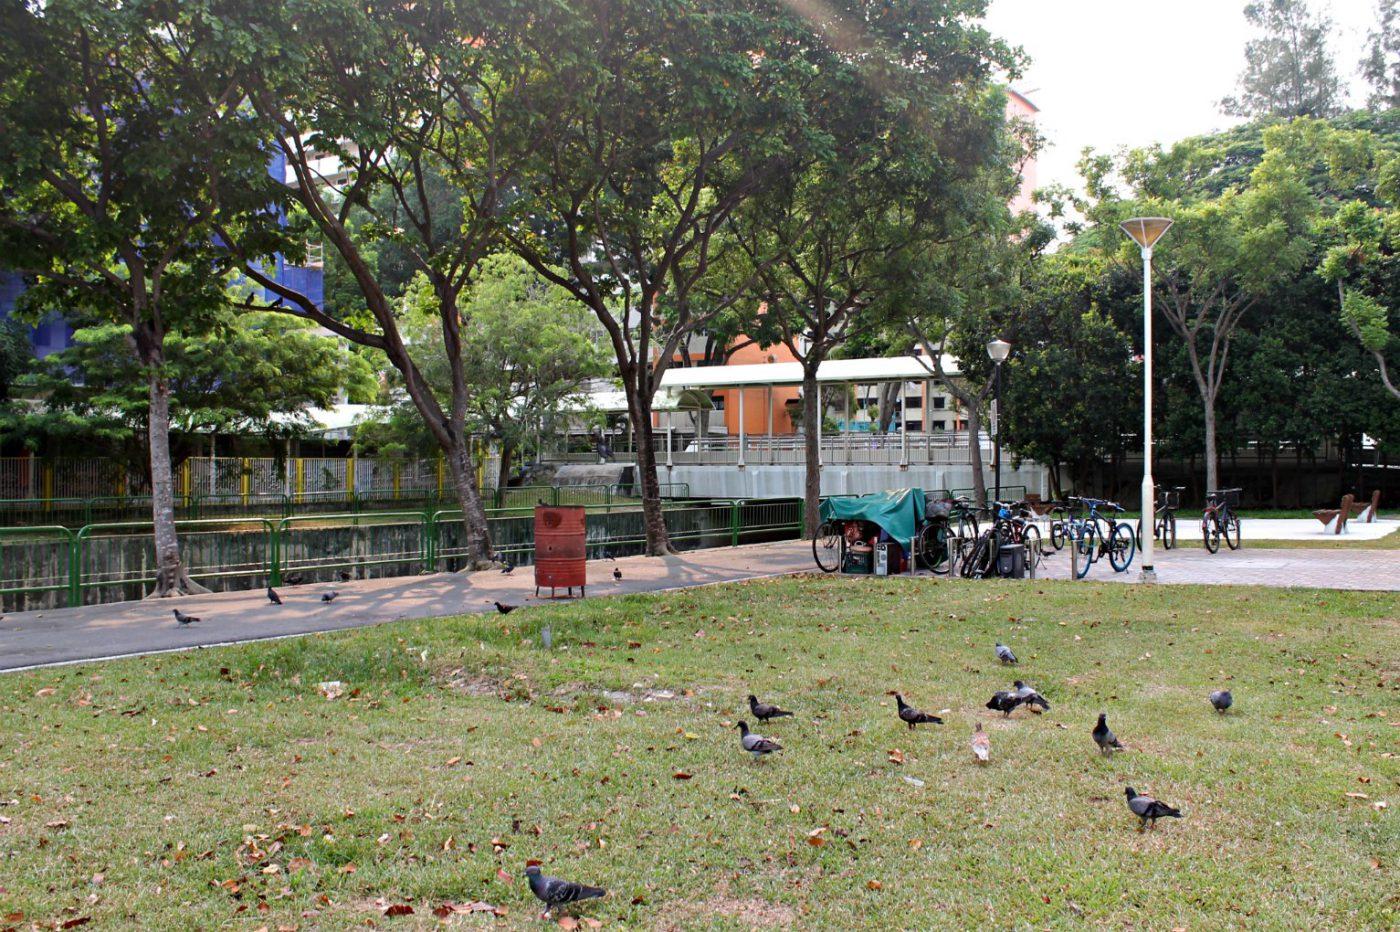 Singapore Urban Park (Istimewa/Ruth Nina)